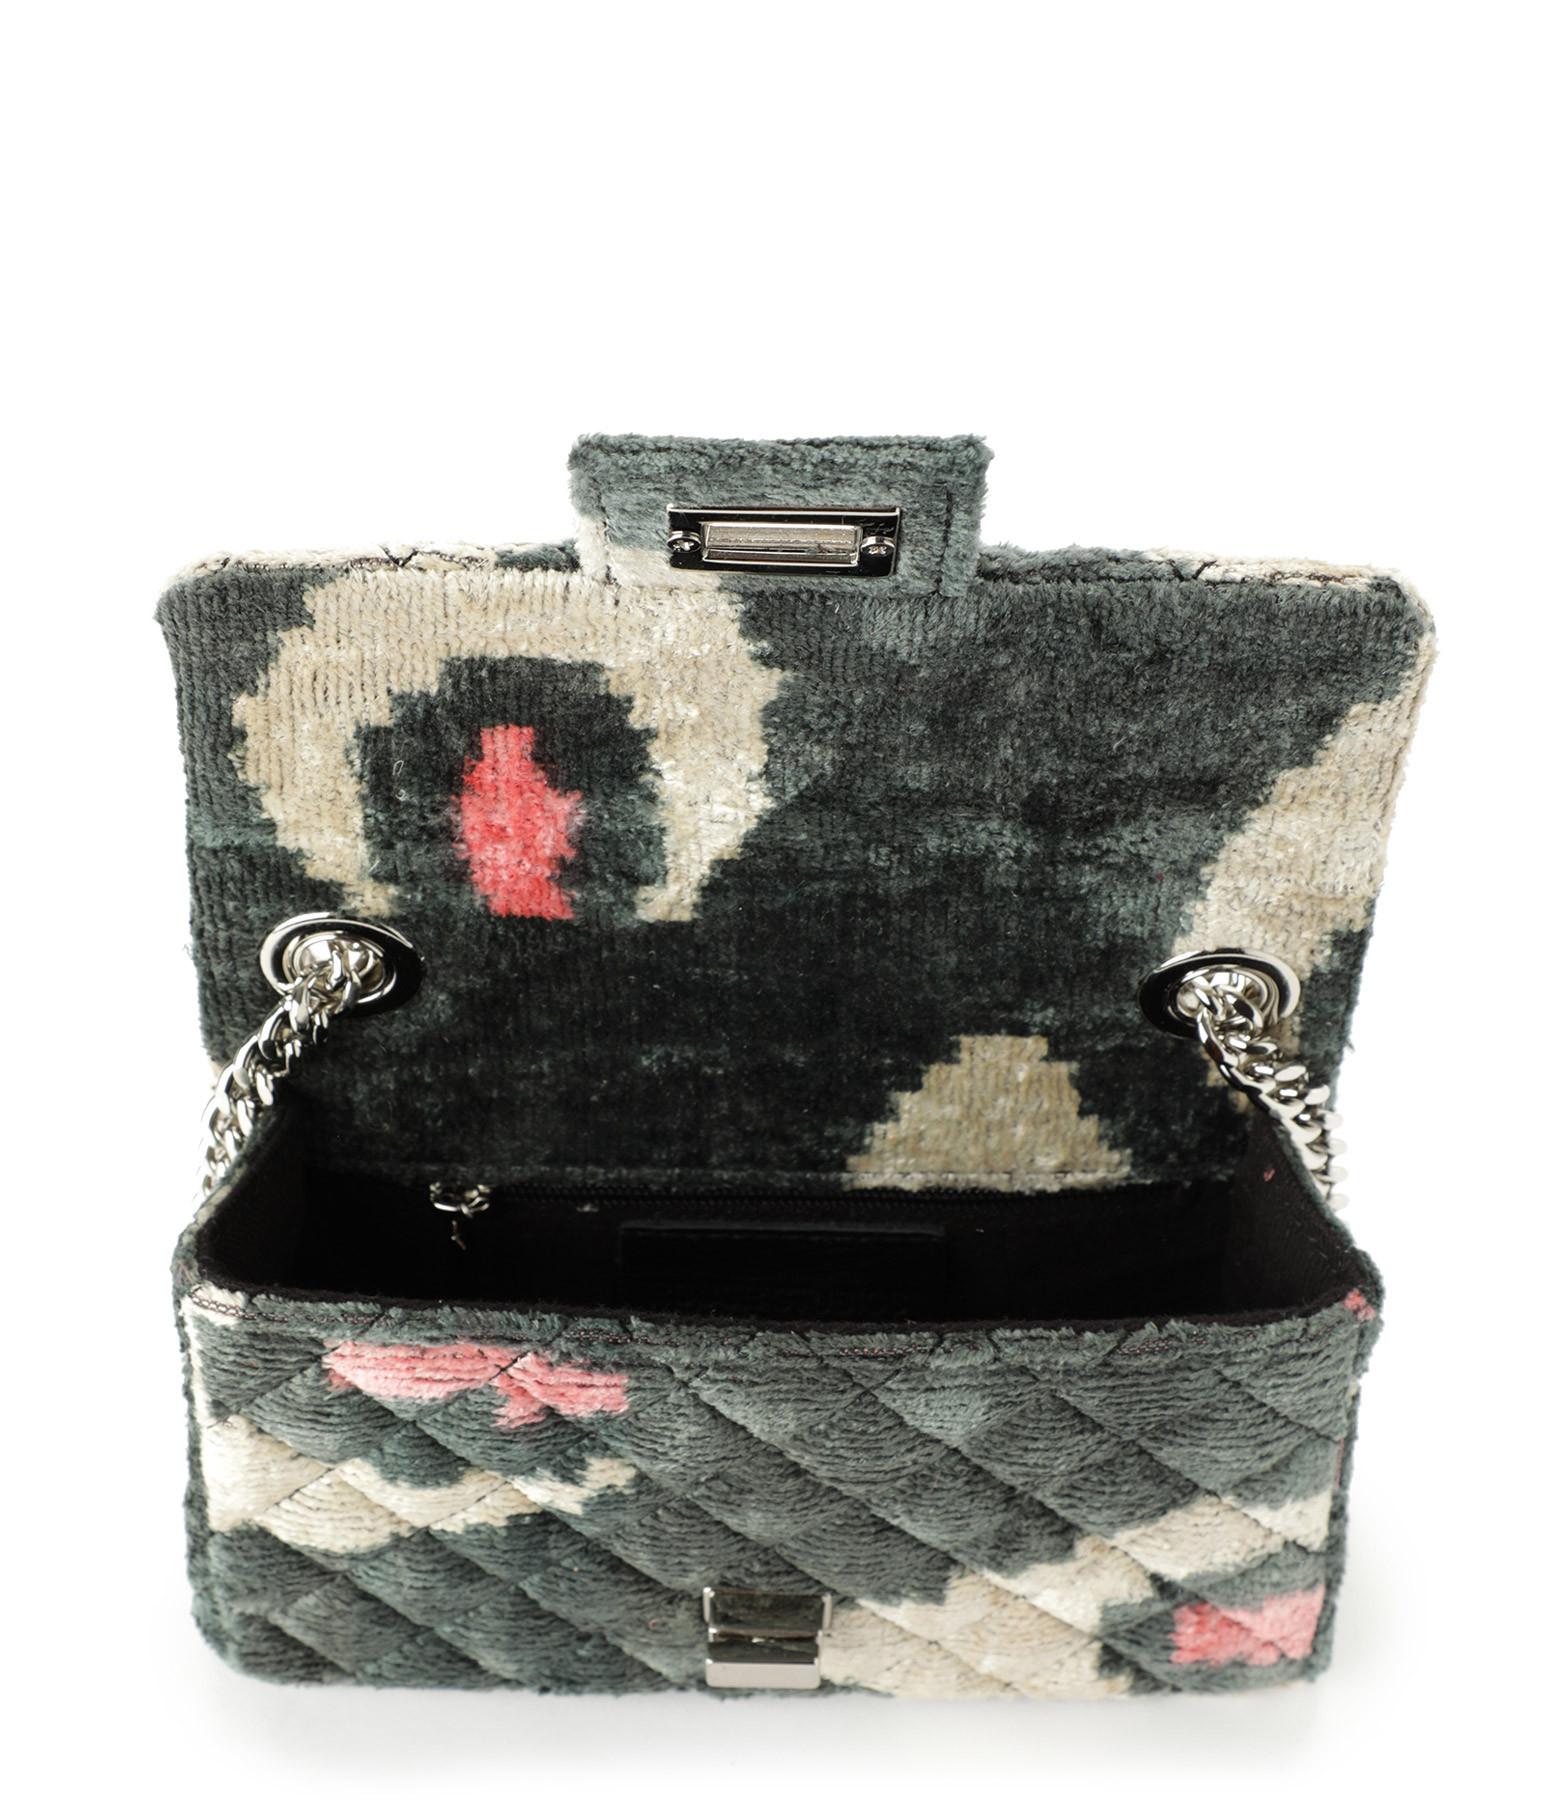 ROUGH STUDIOS - Sac Mini Bandita Velours Soie Noir Rose